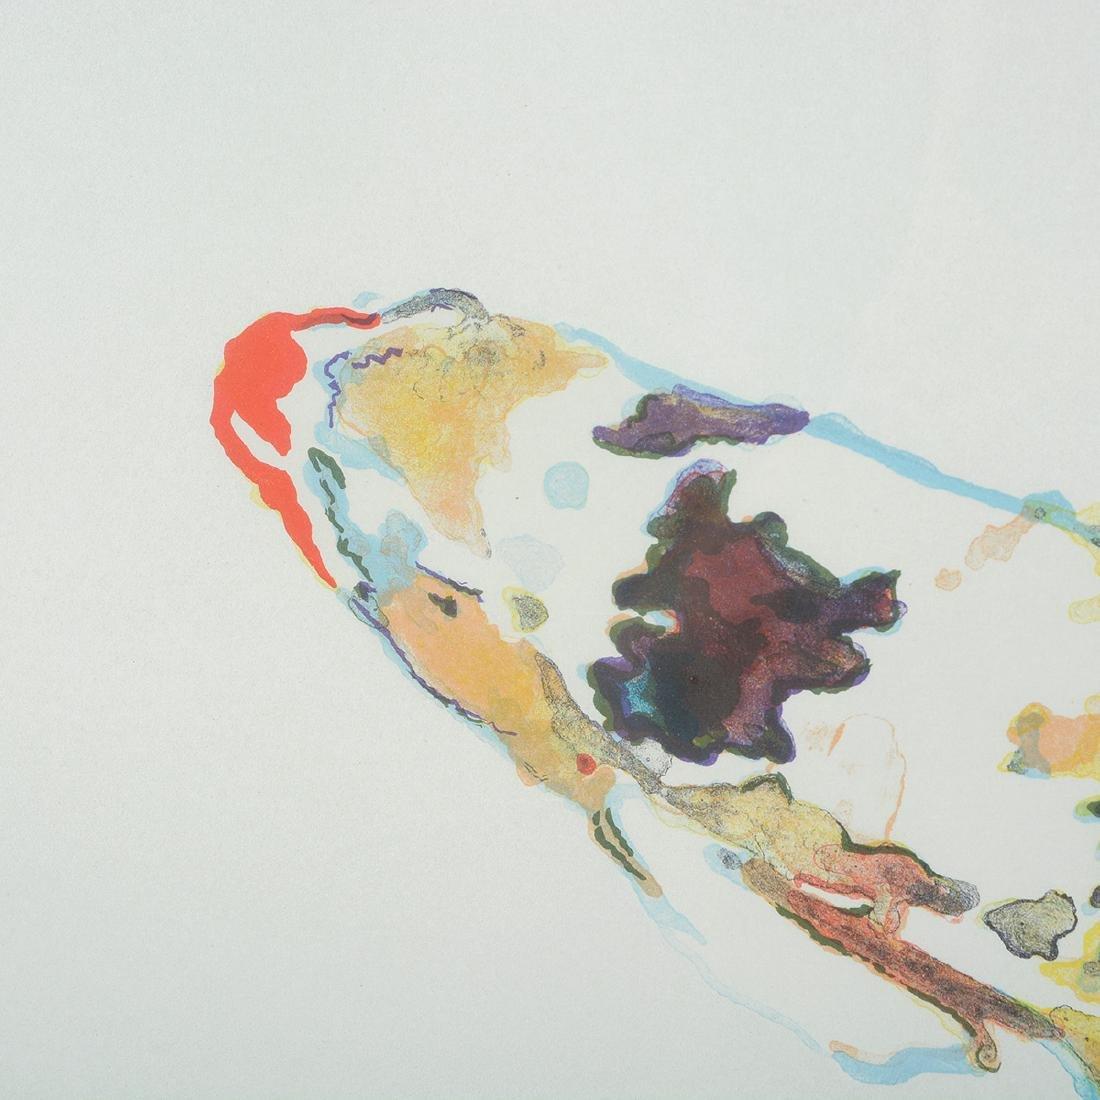 Joseph Raffael, Water lilies & Haiku Fish III lithos - 3